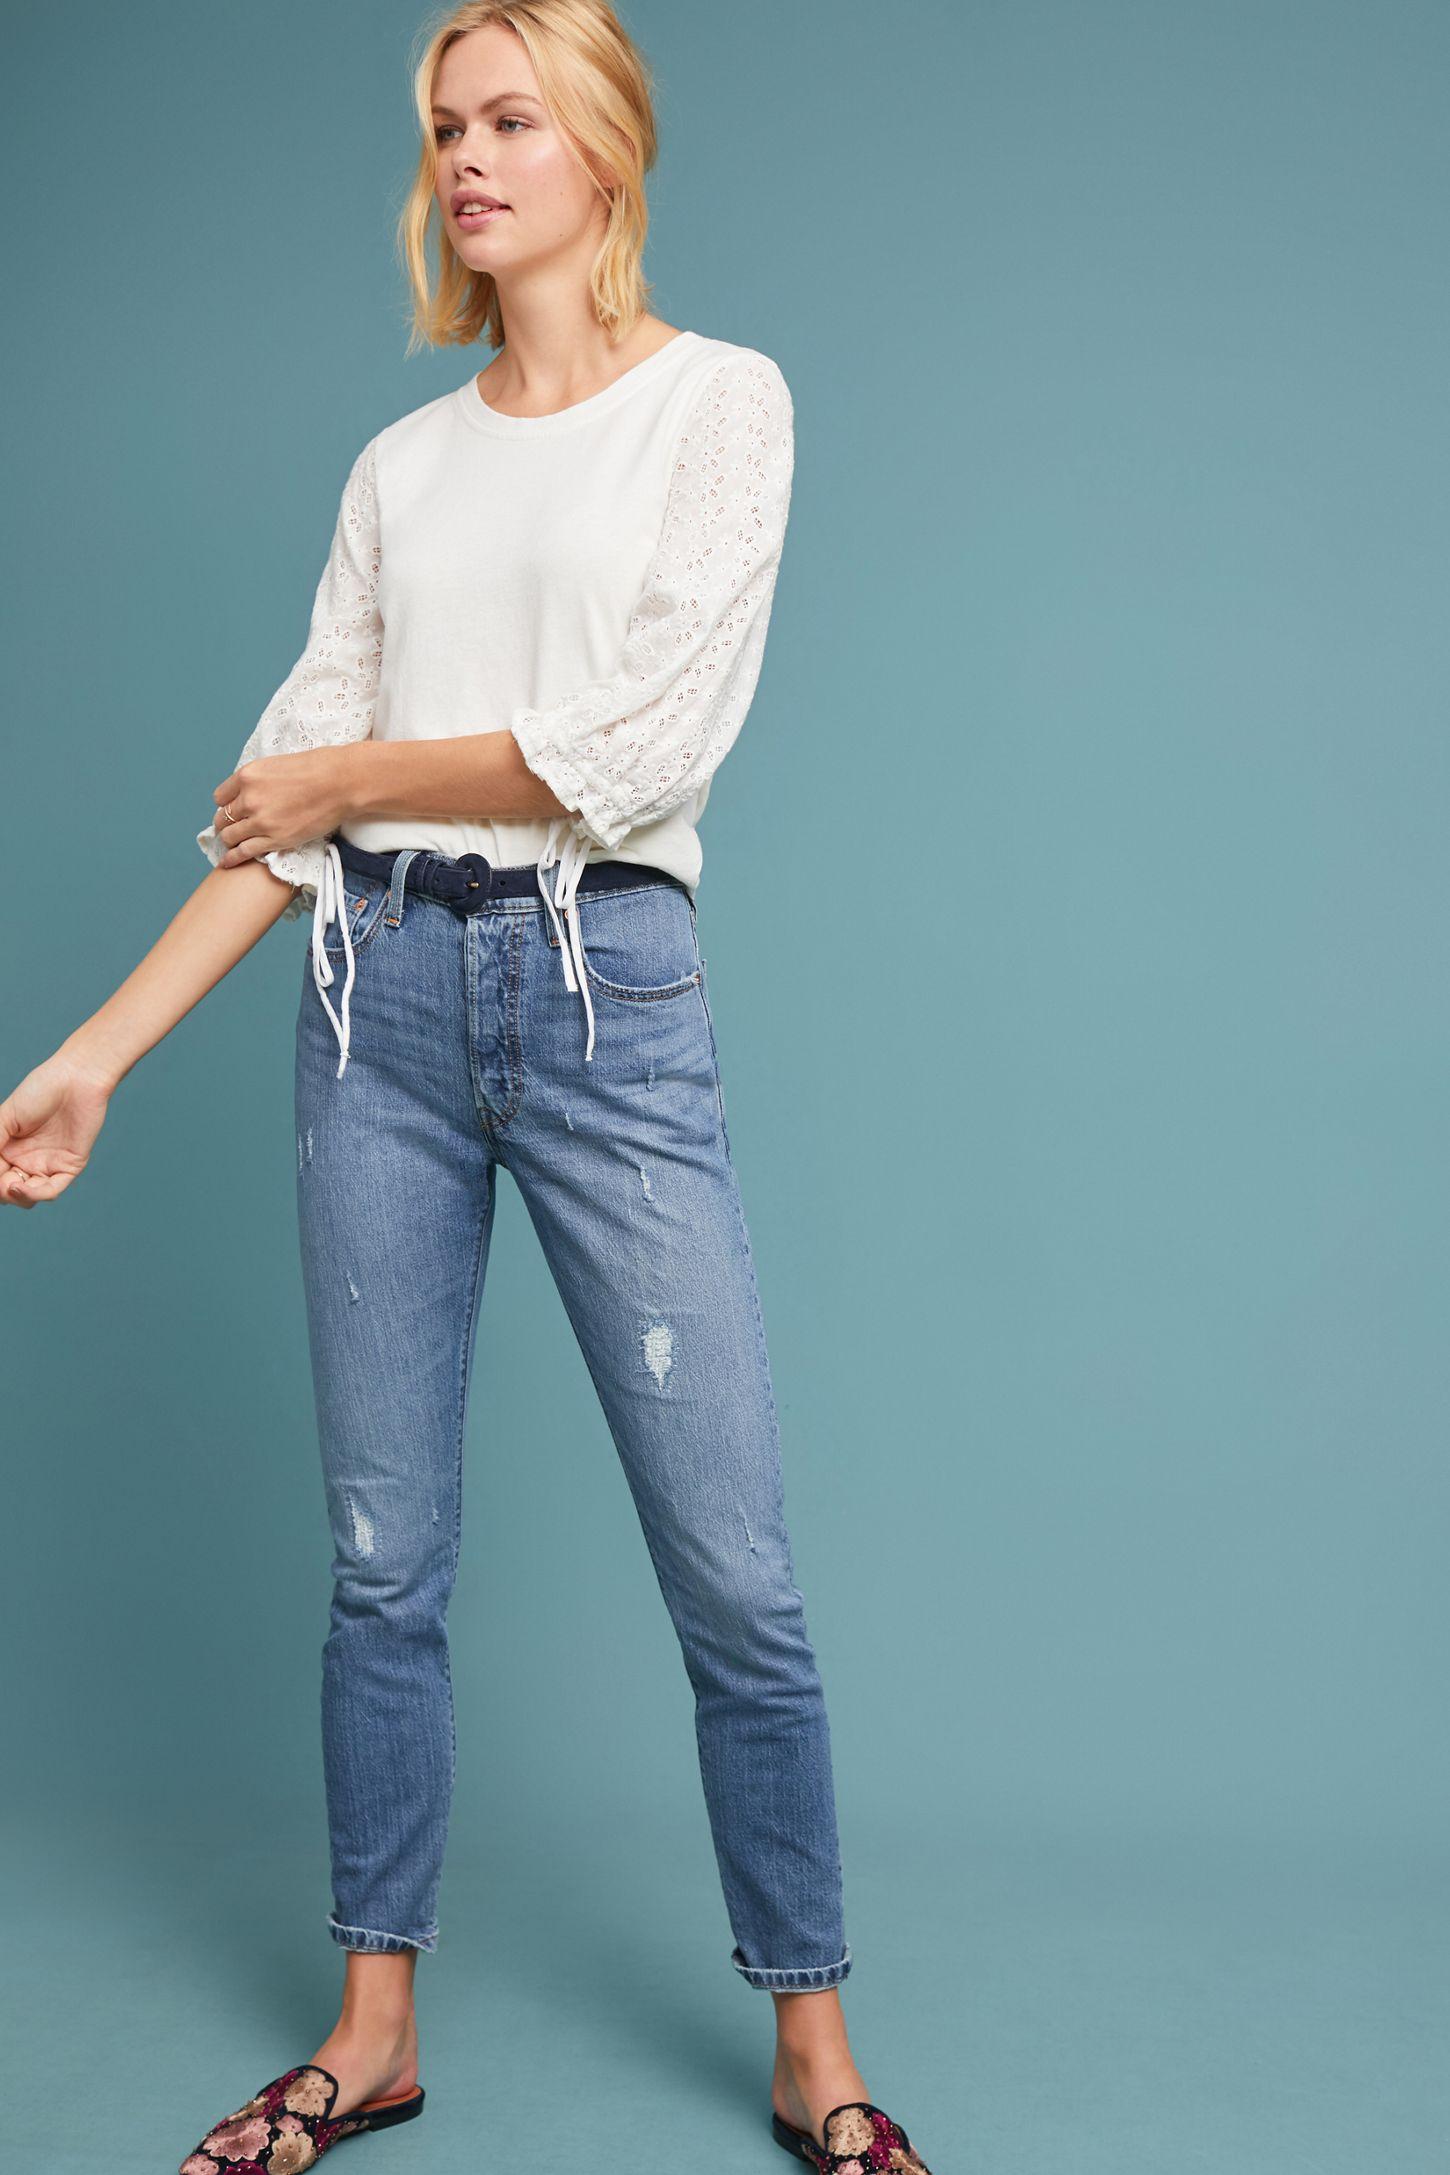 97335a3be9e Levi s 501 Ultra High-Rise Skinny Jeans